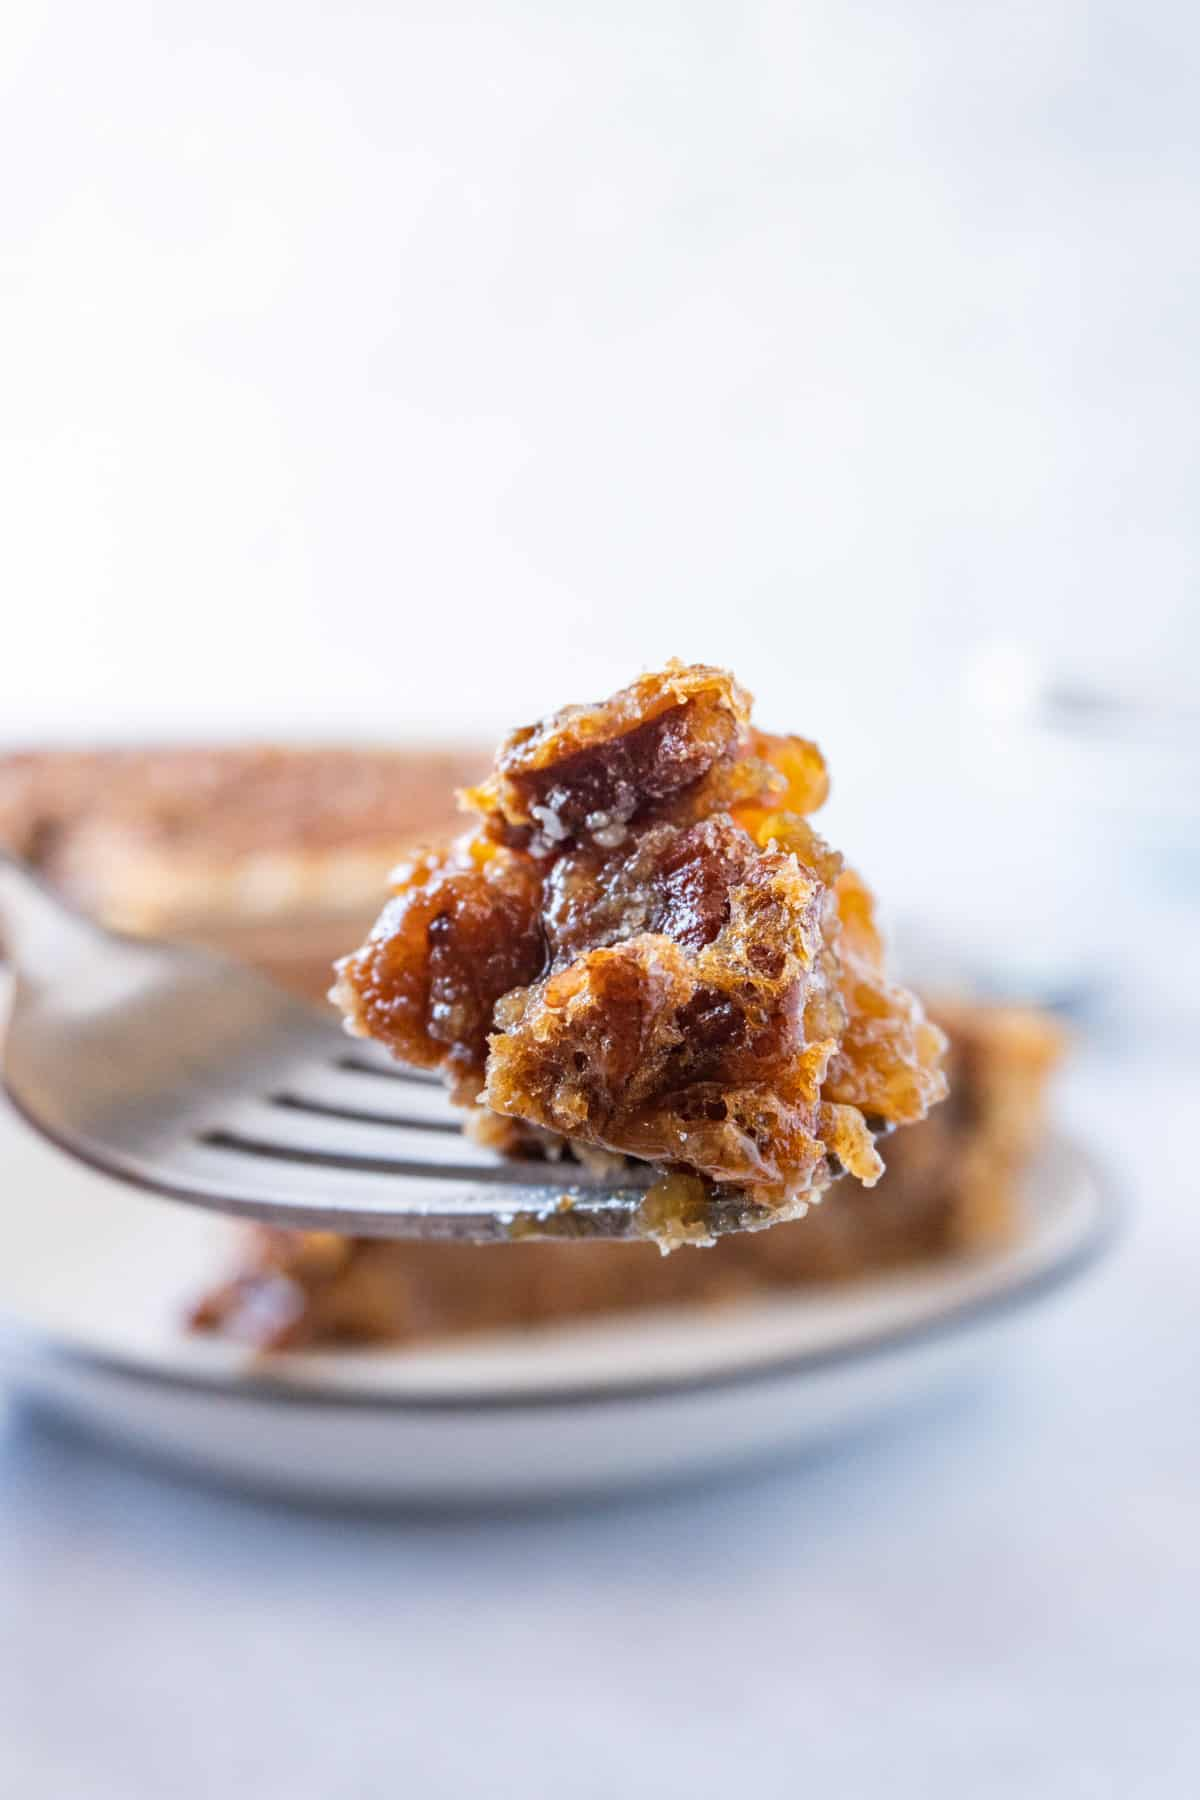 piece of pecan pie on fork